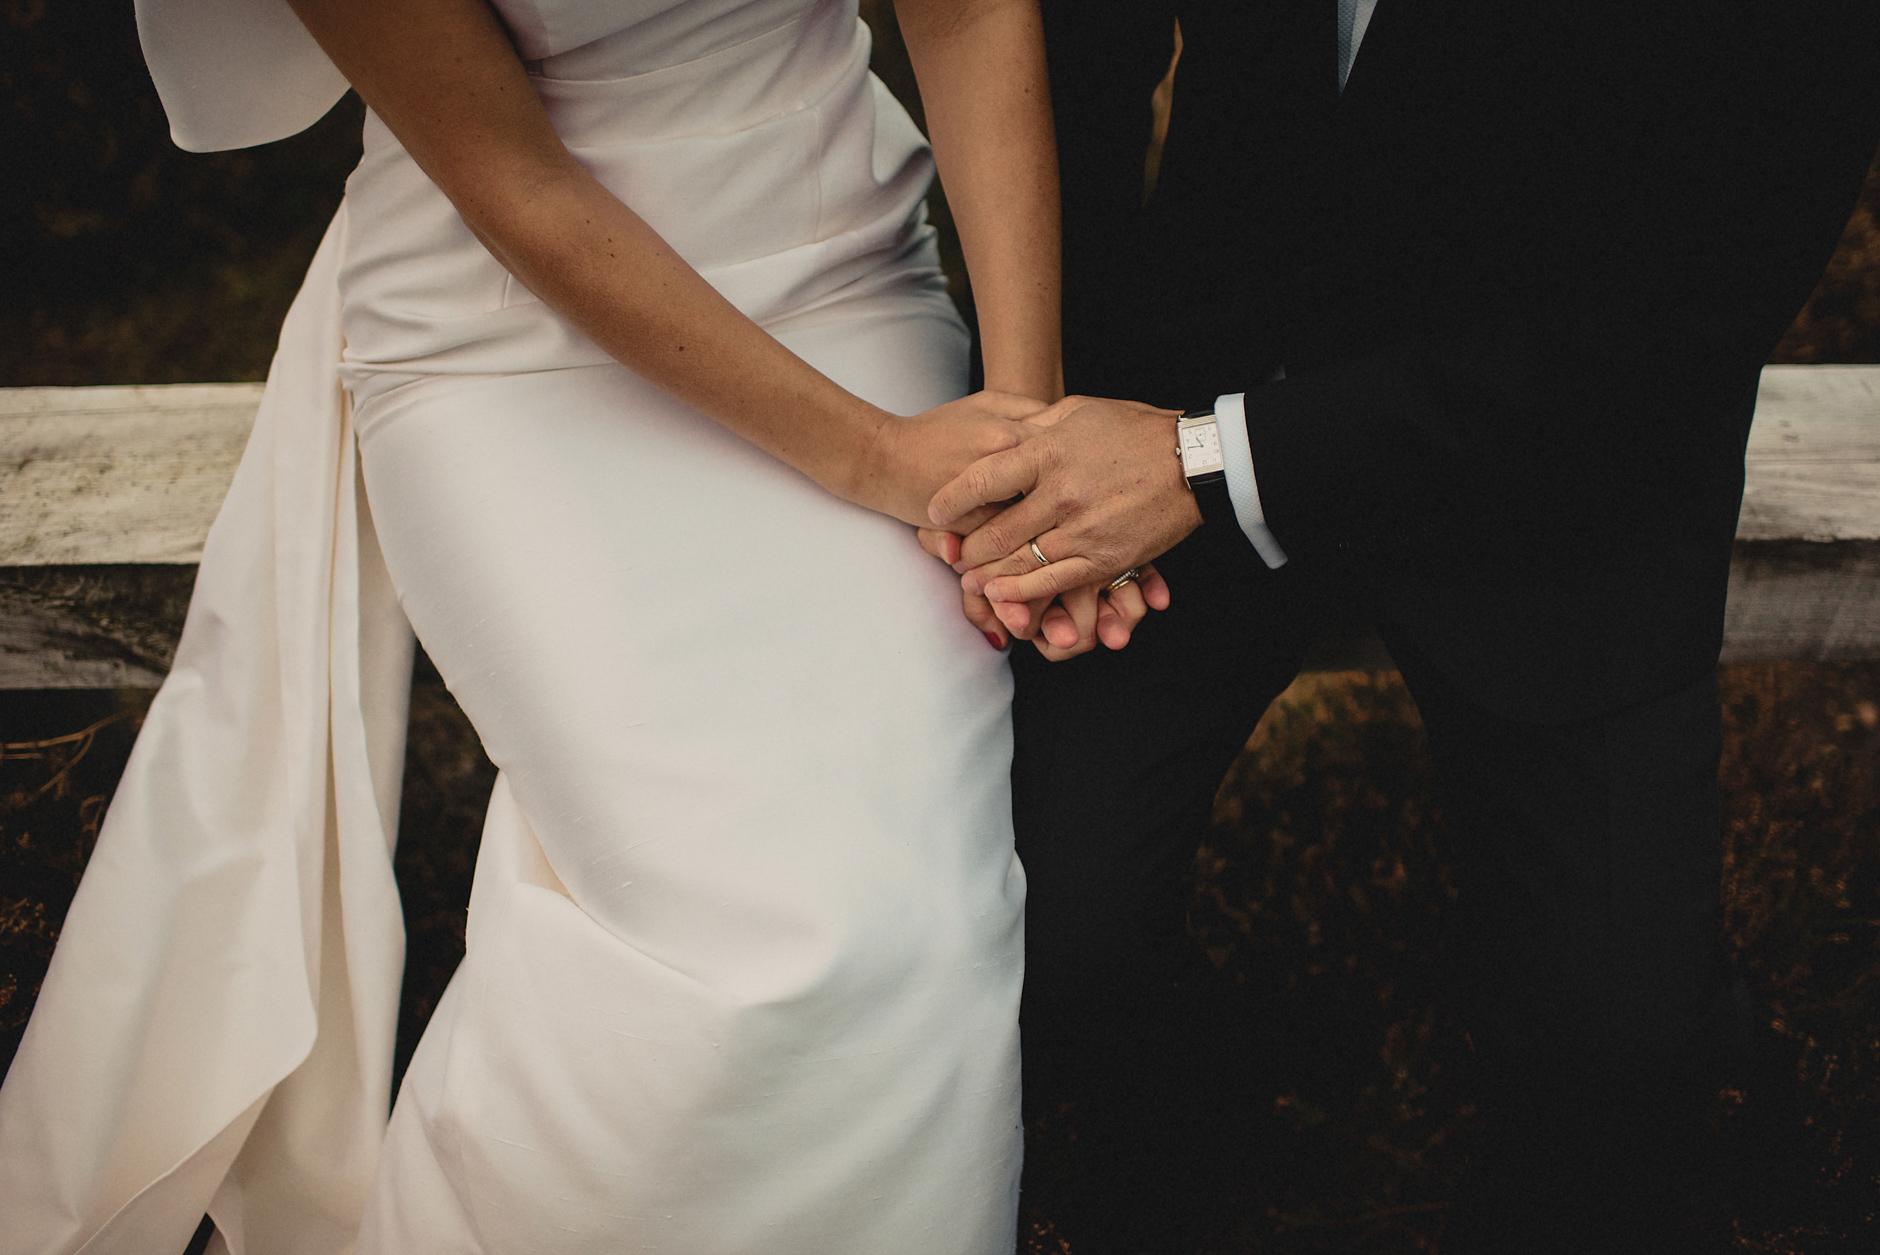 Glentruim-Wedding-Nikki-Leadbetter-Photography-179.jpg